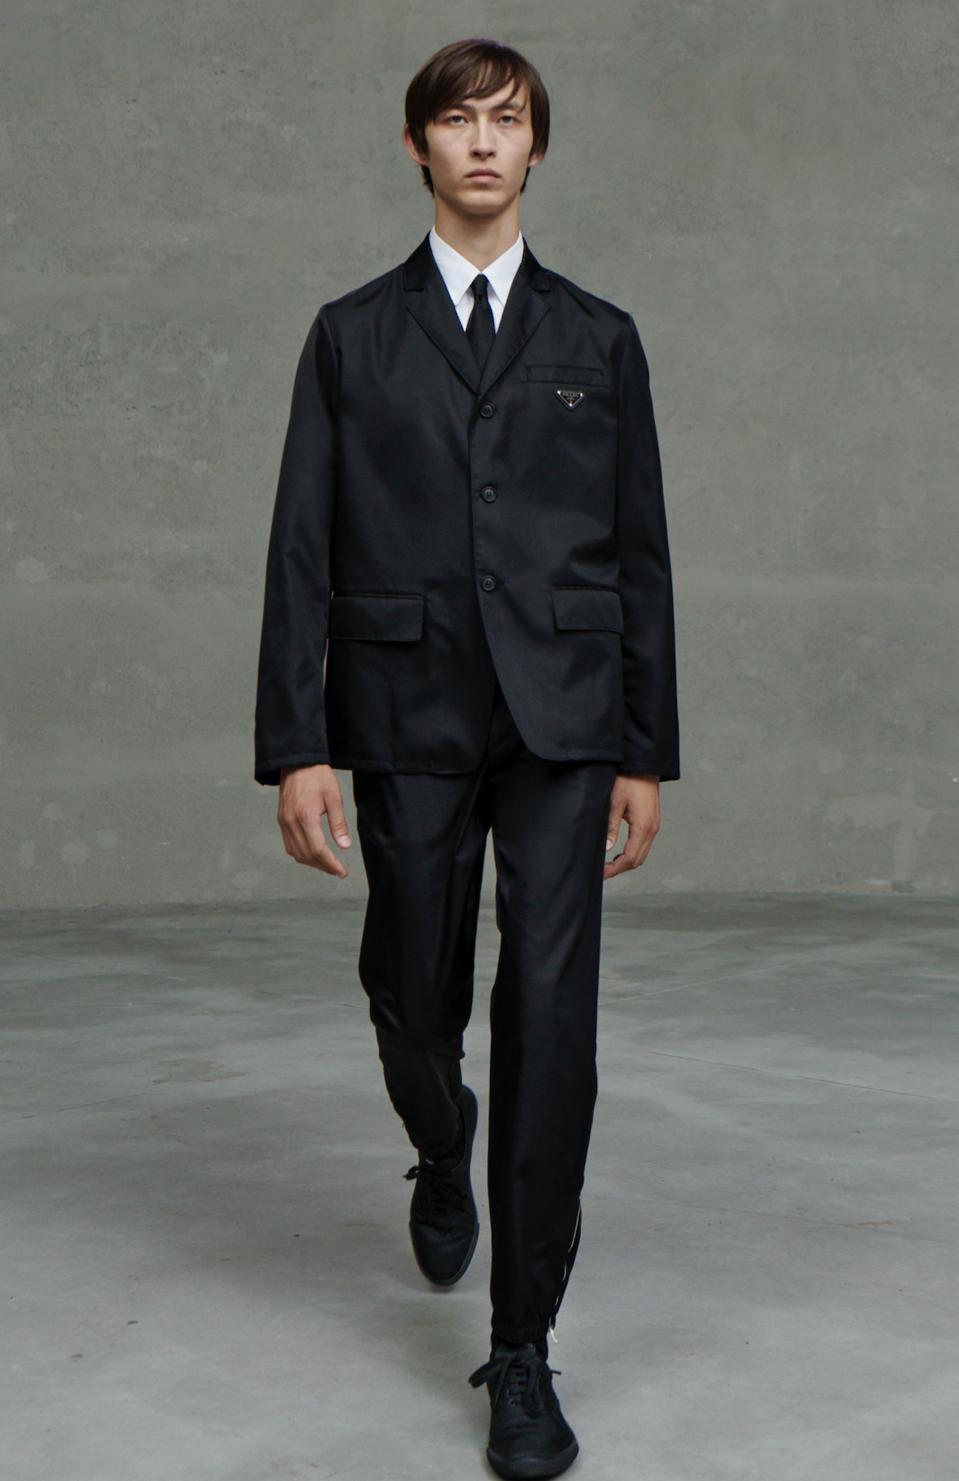 Prada Menswear SS21